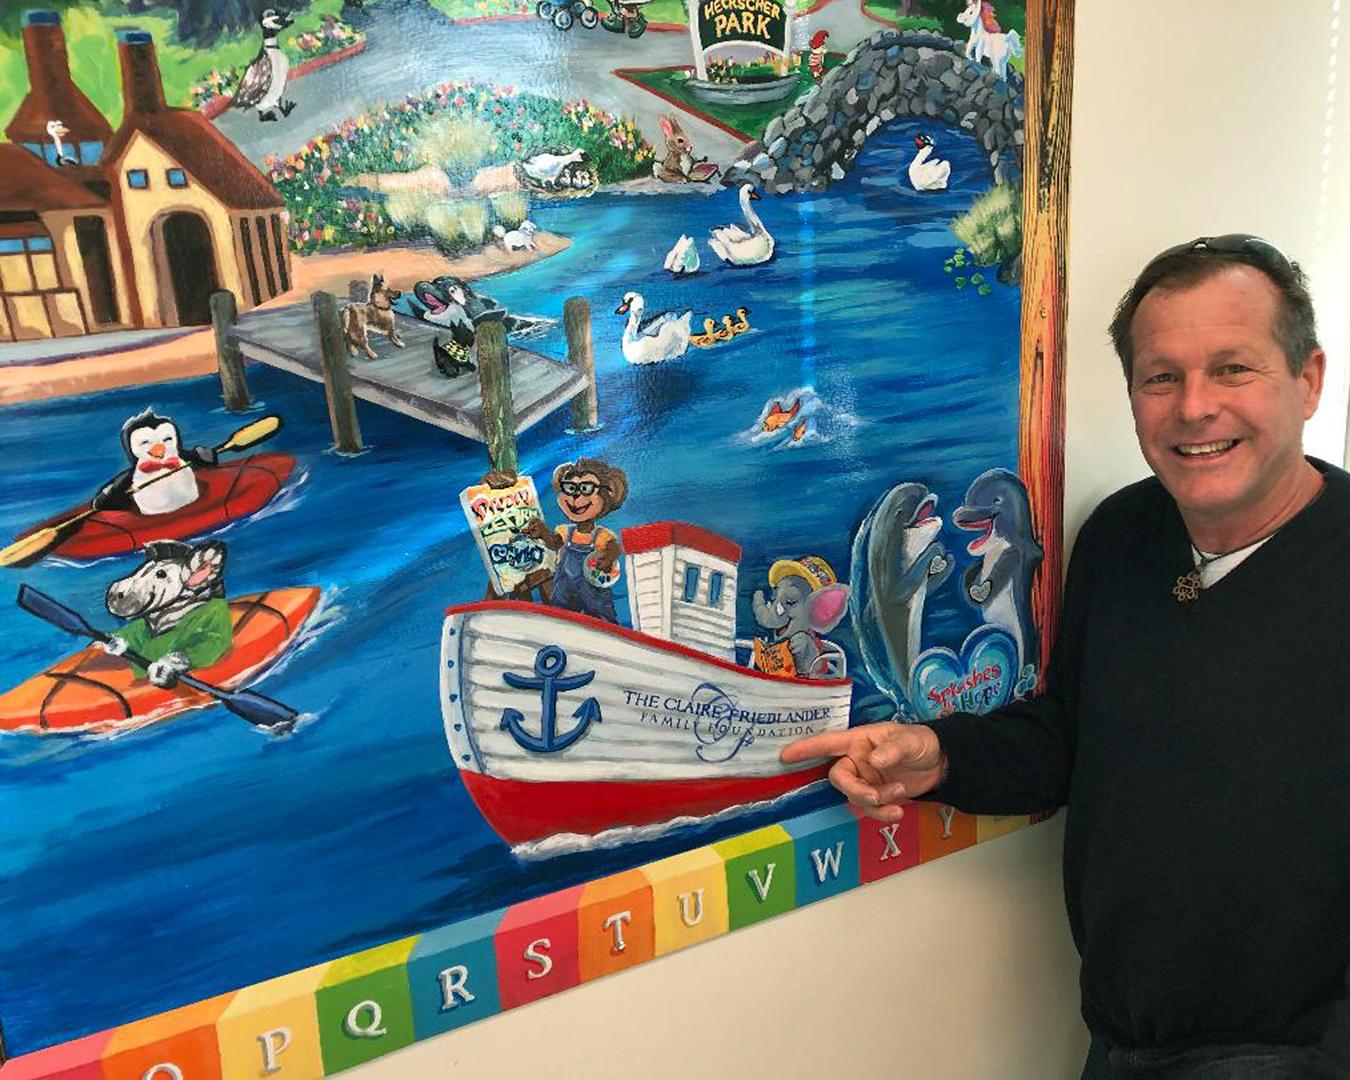 Splashes of Hope volunteer Jimmy Knapp shows off the mural recognizing its sponsor, the Claire Friedlander Foundation.